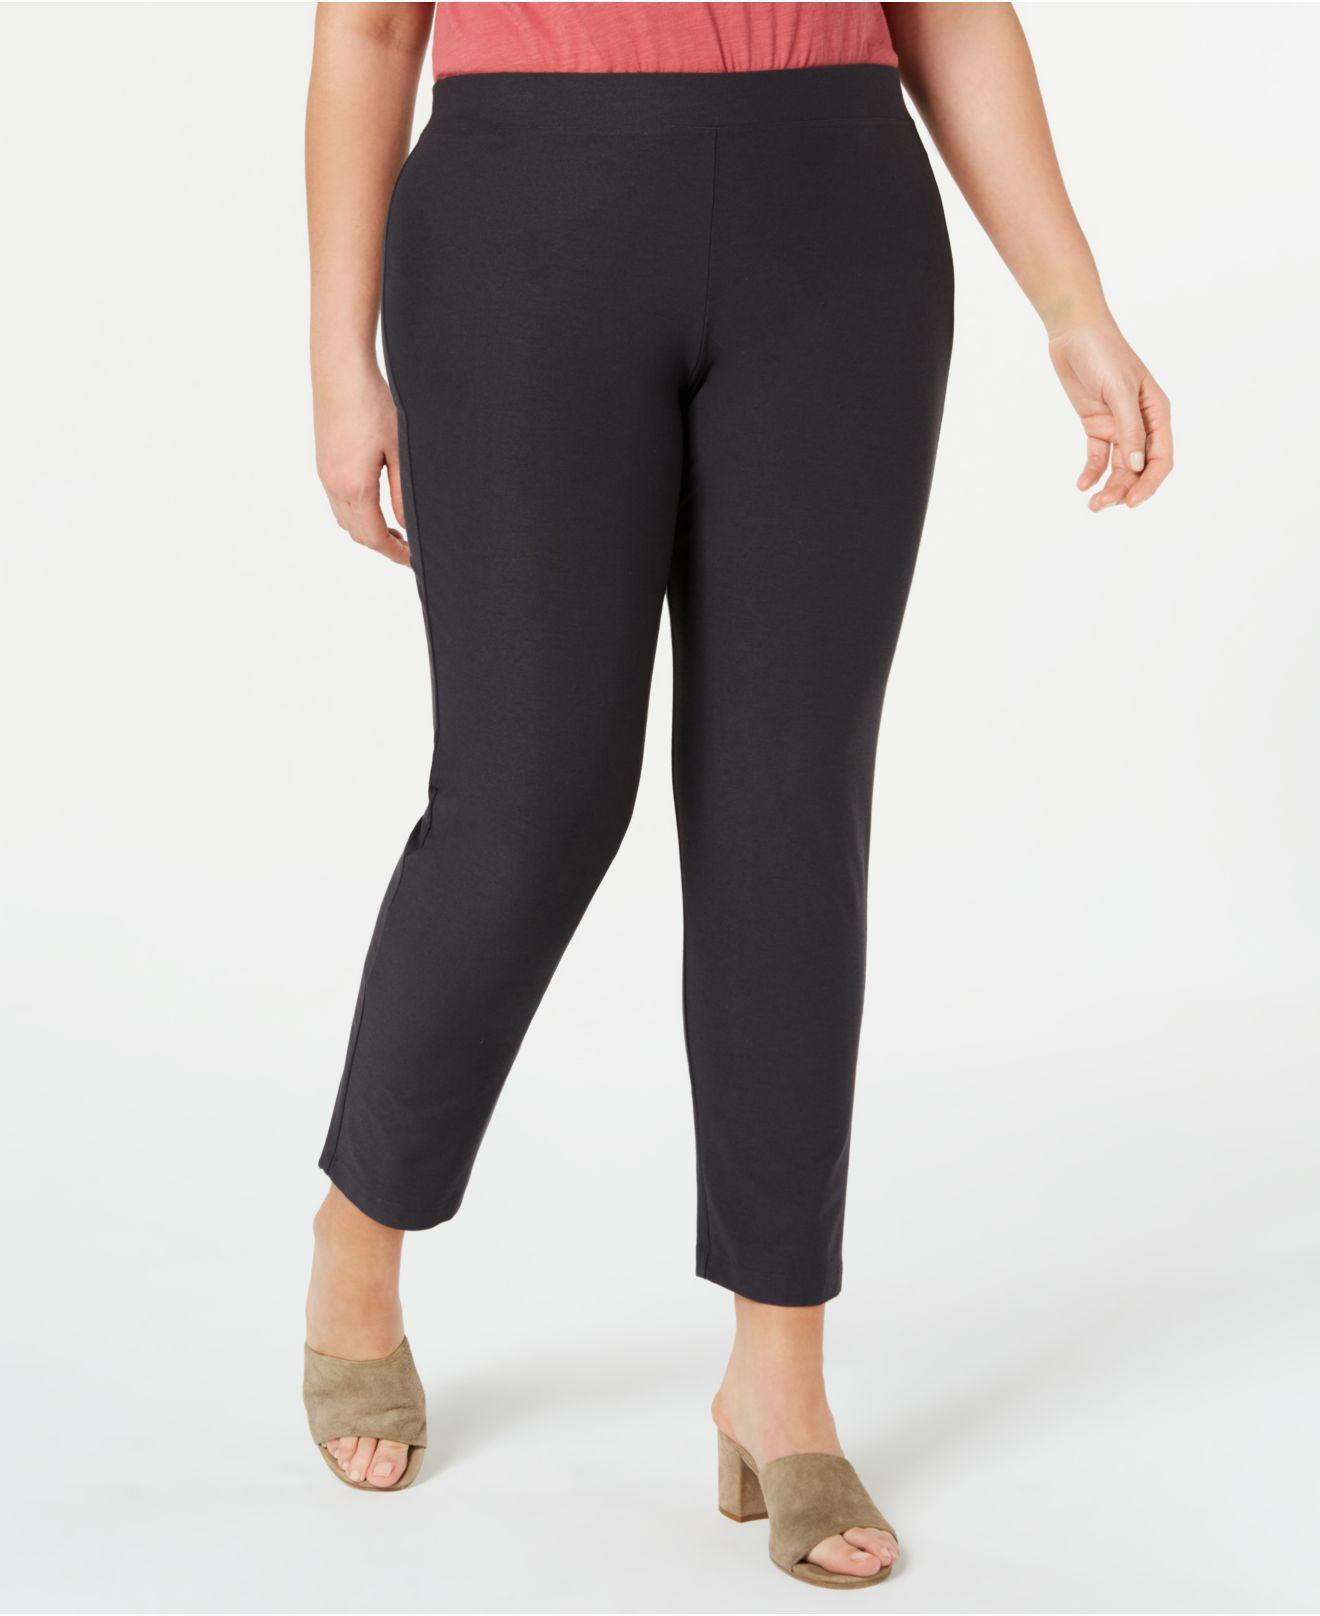 0aebb9f3ae1 Lyst - Eileen Fisher Plus Size Slim Ankle Pants in Black